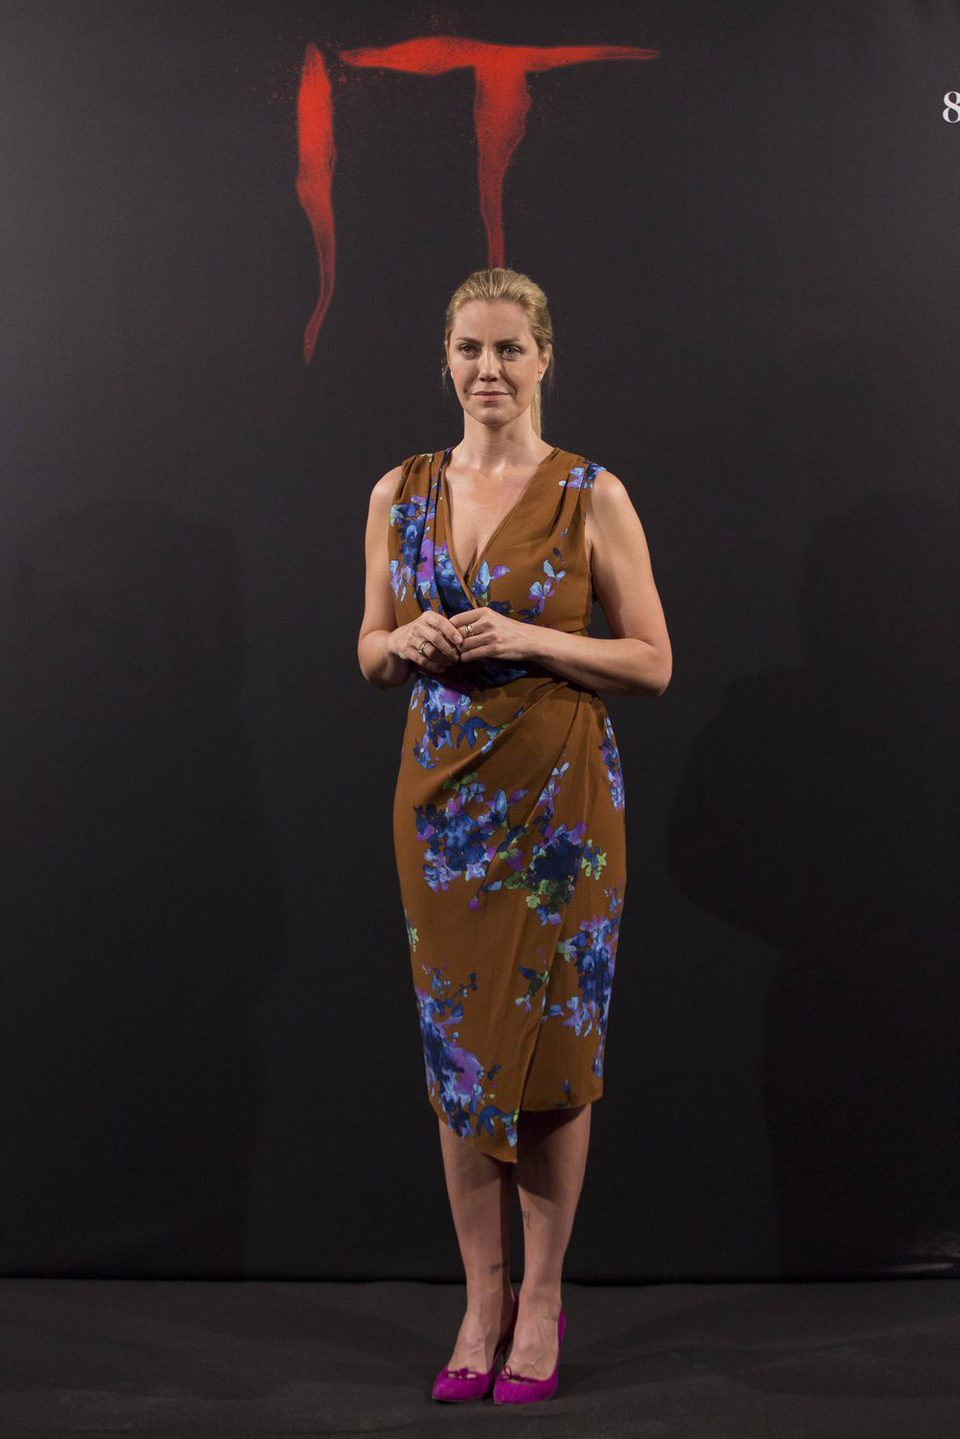 Barbara Muschietti at 'It' presentation in Madrid